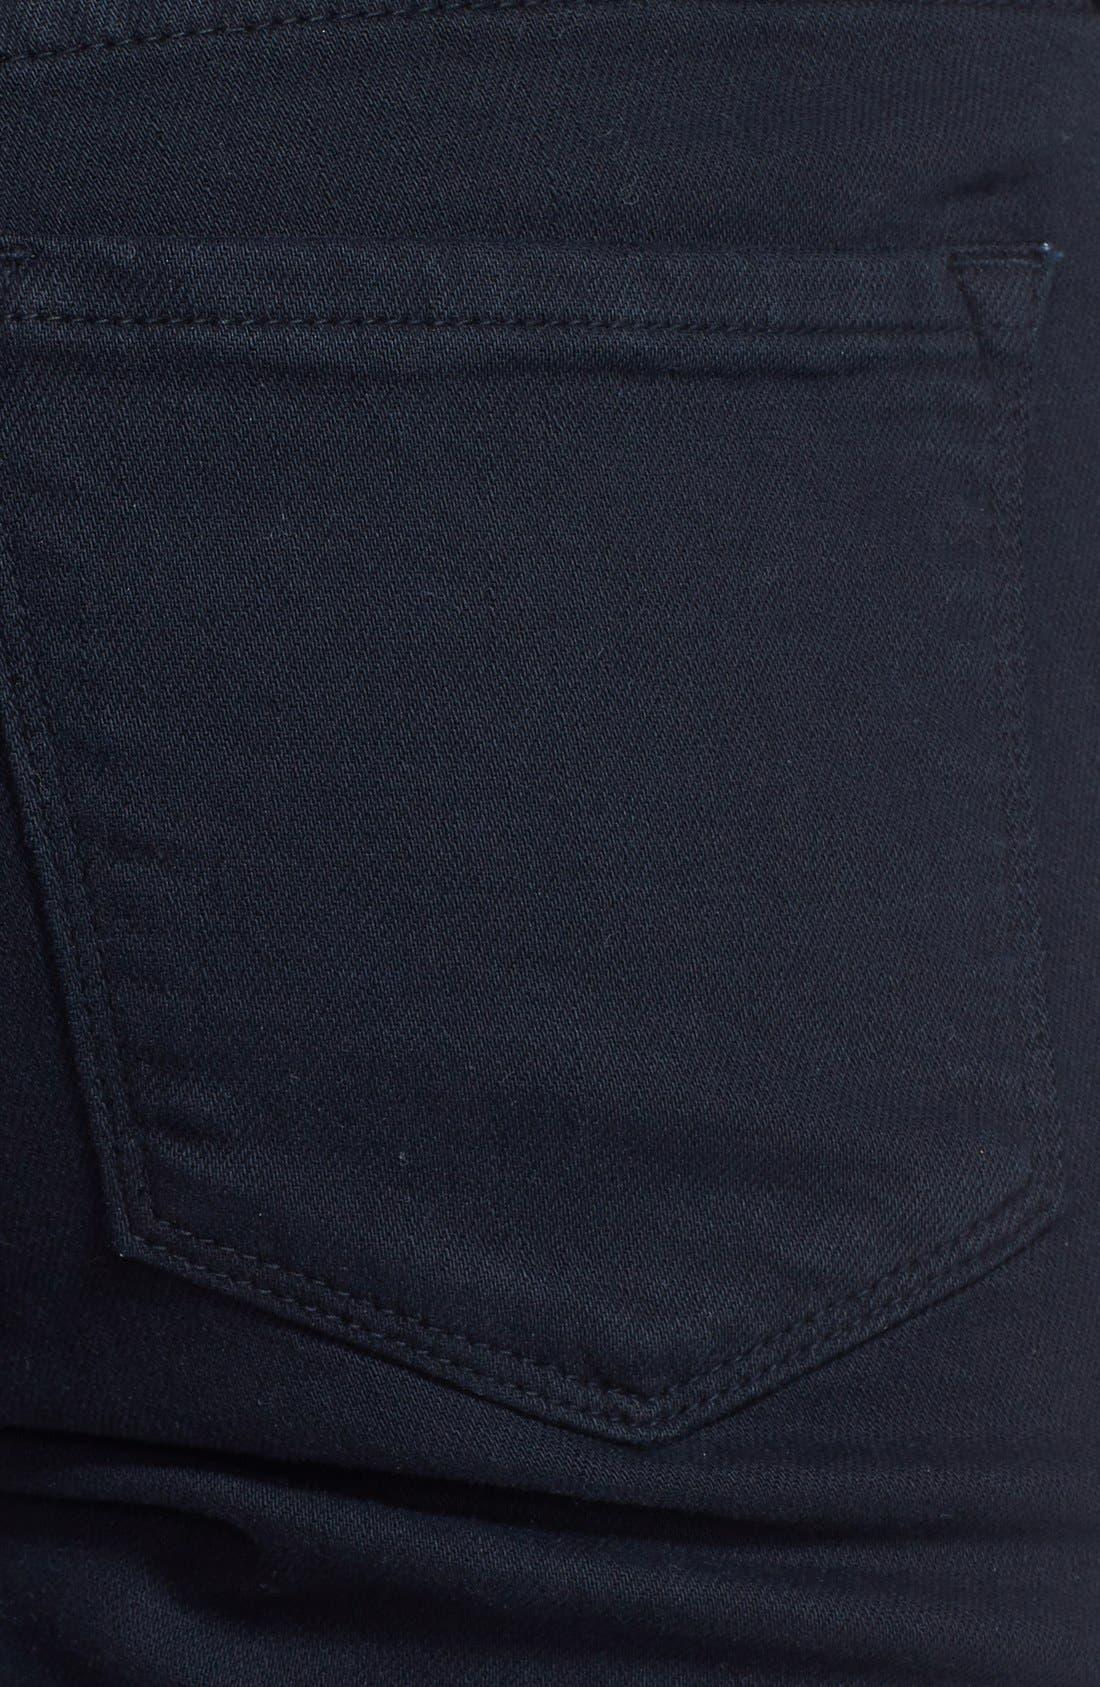 Alternate Image 3  - Frame Denim 'Le Garcon' Boyfriend Jeans (Noir)